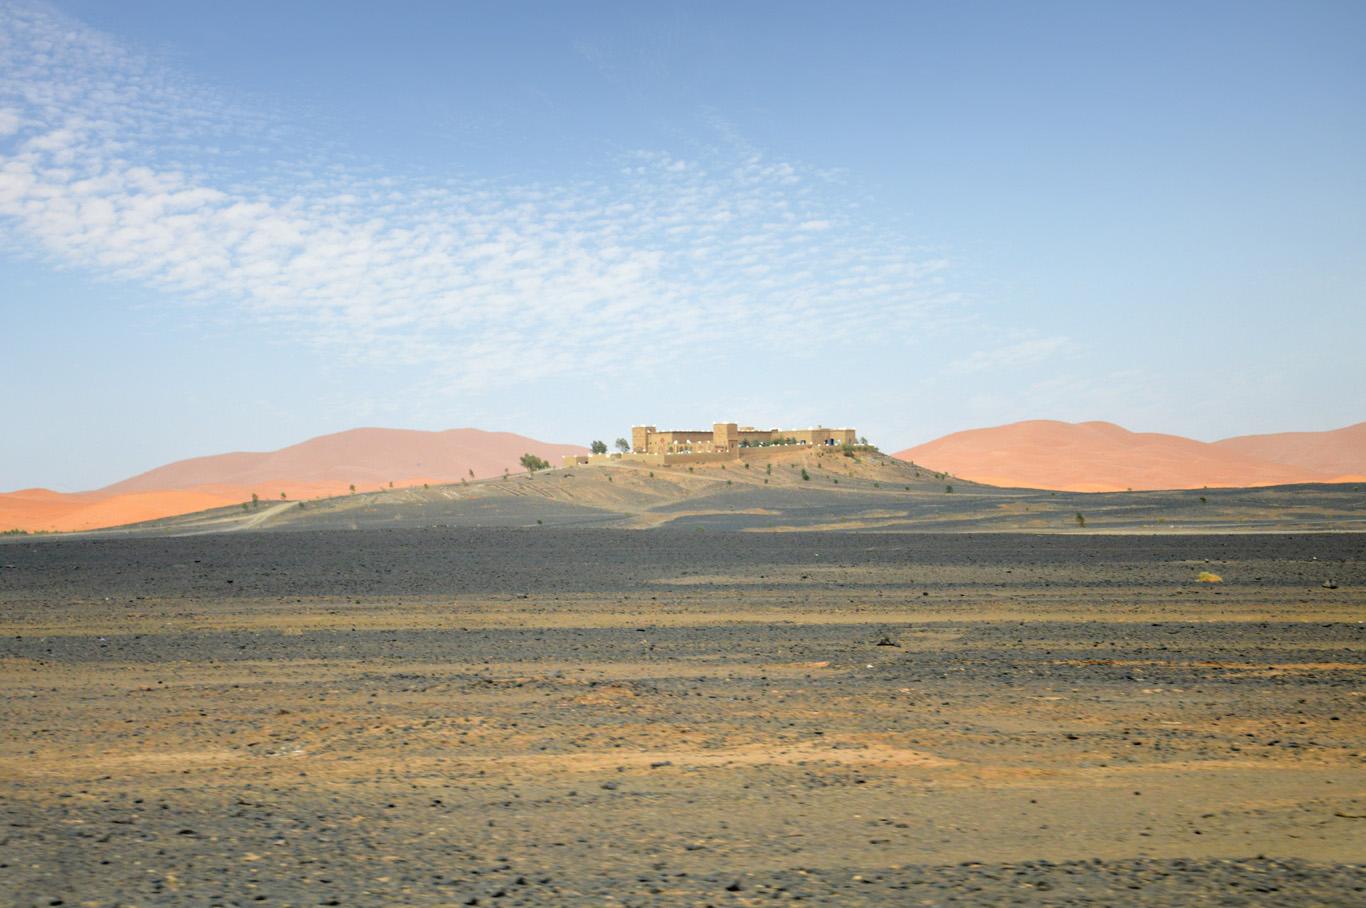 On the way to Sahara